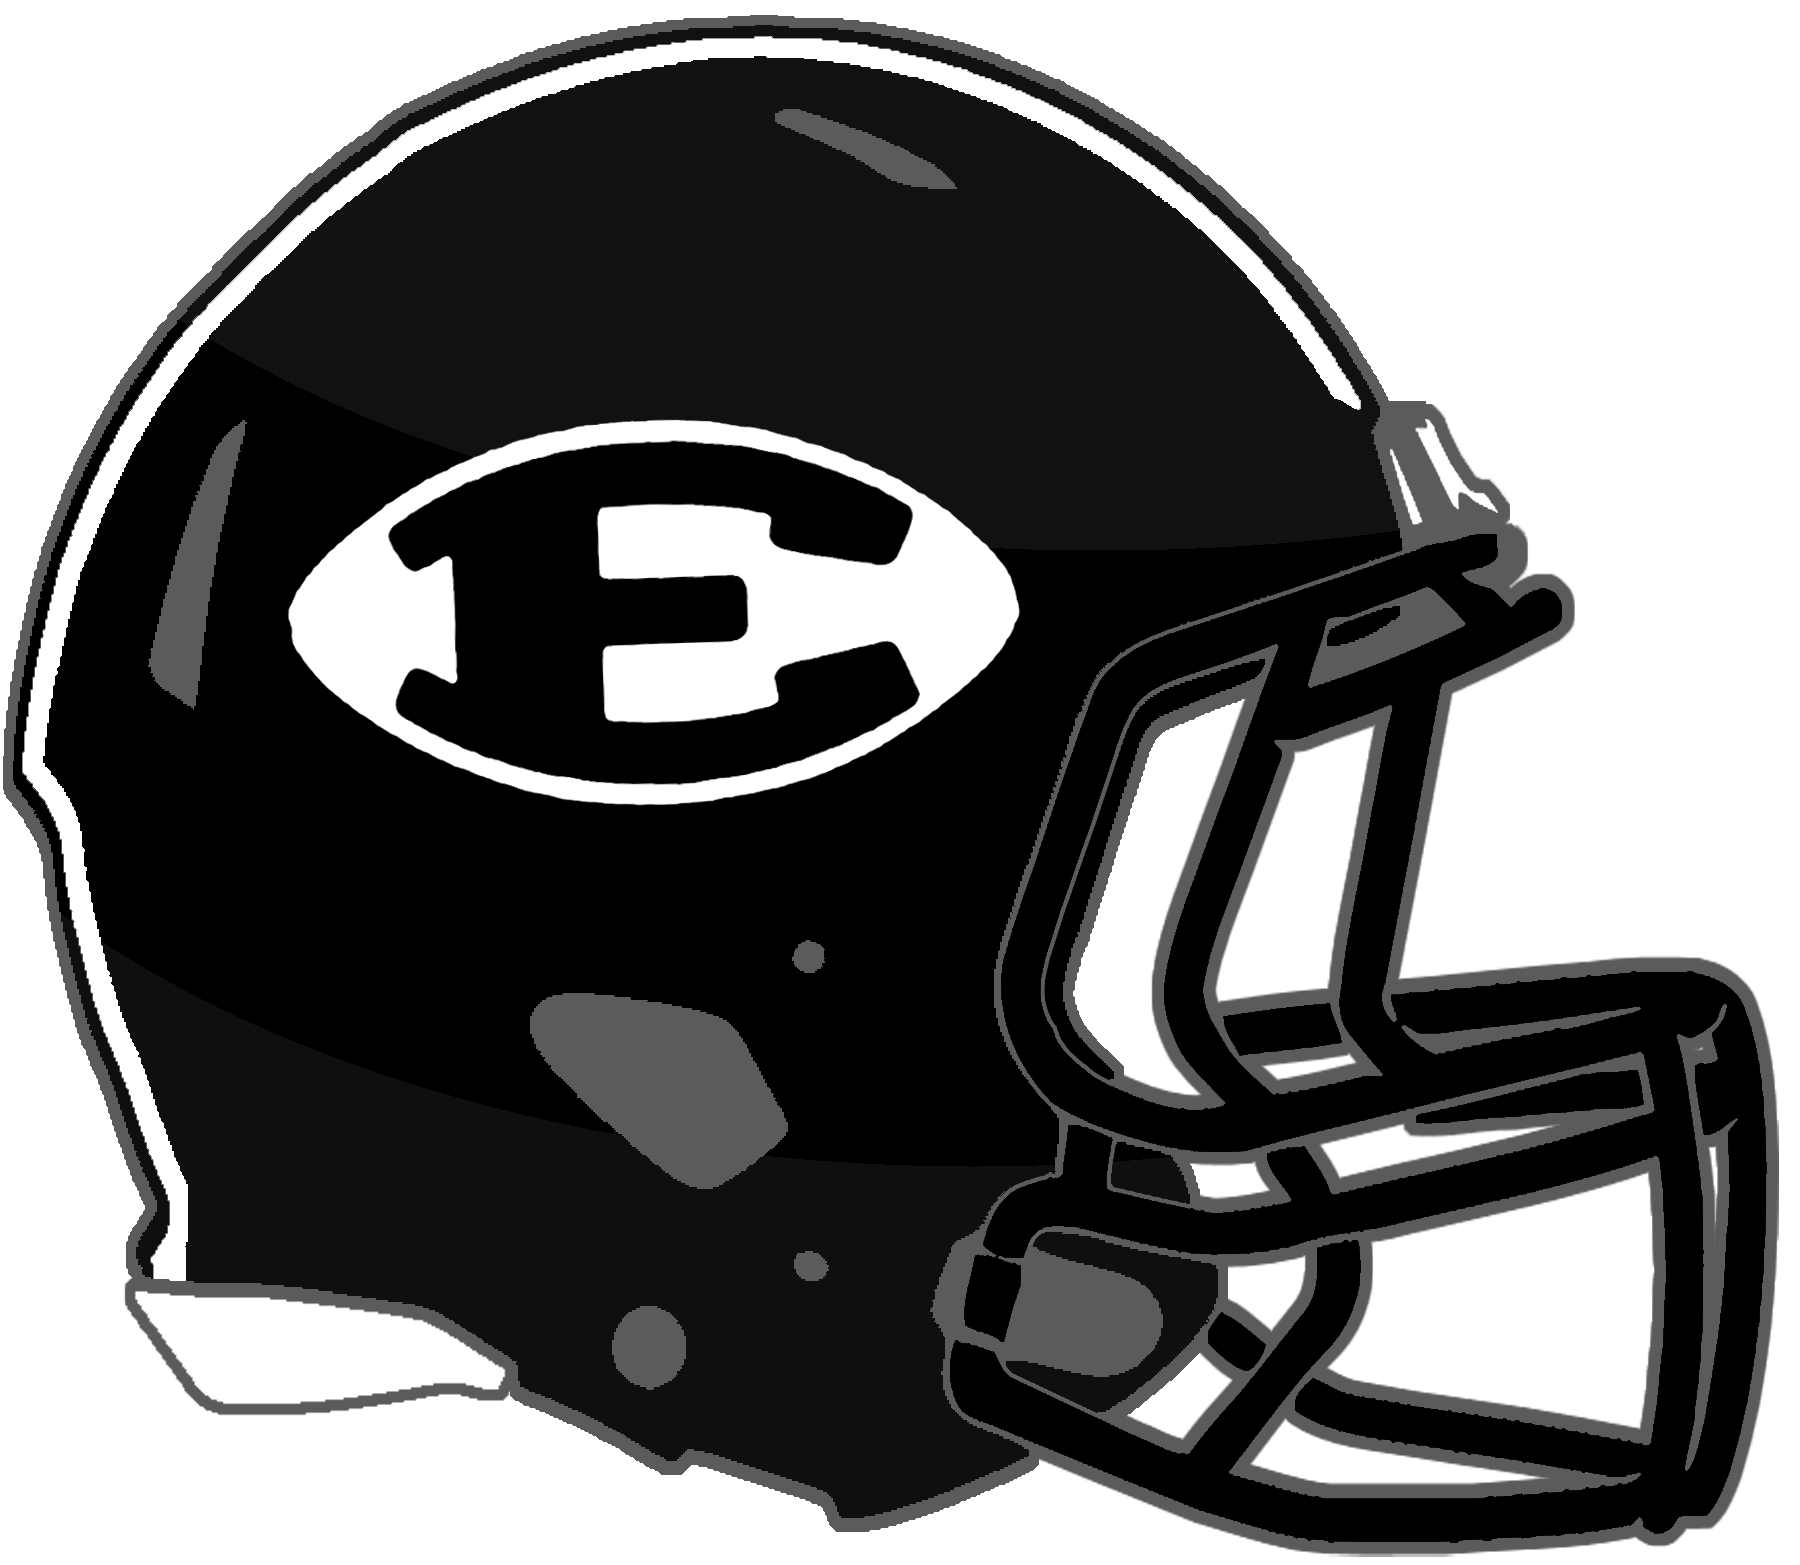 Black football helmet clipart picture transparent download Mississippi High School Football Helmets: 2A picture transparent download